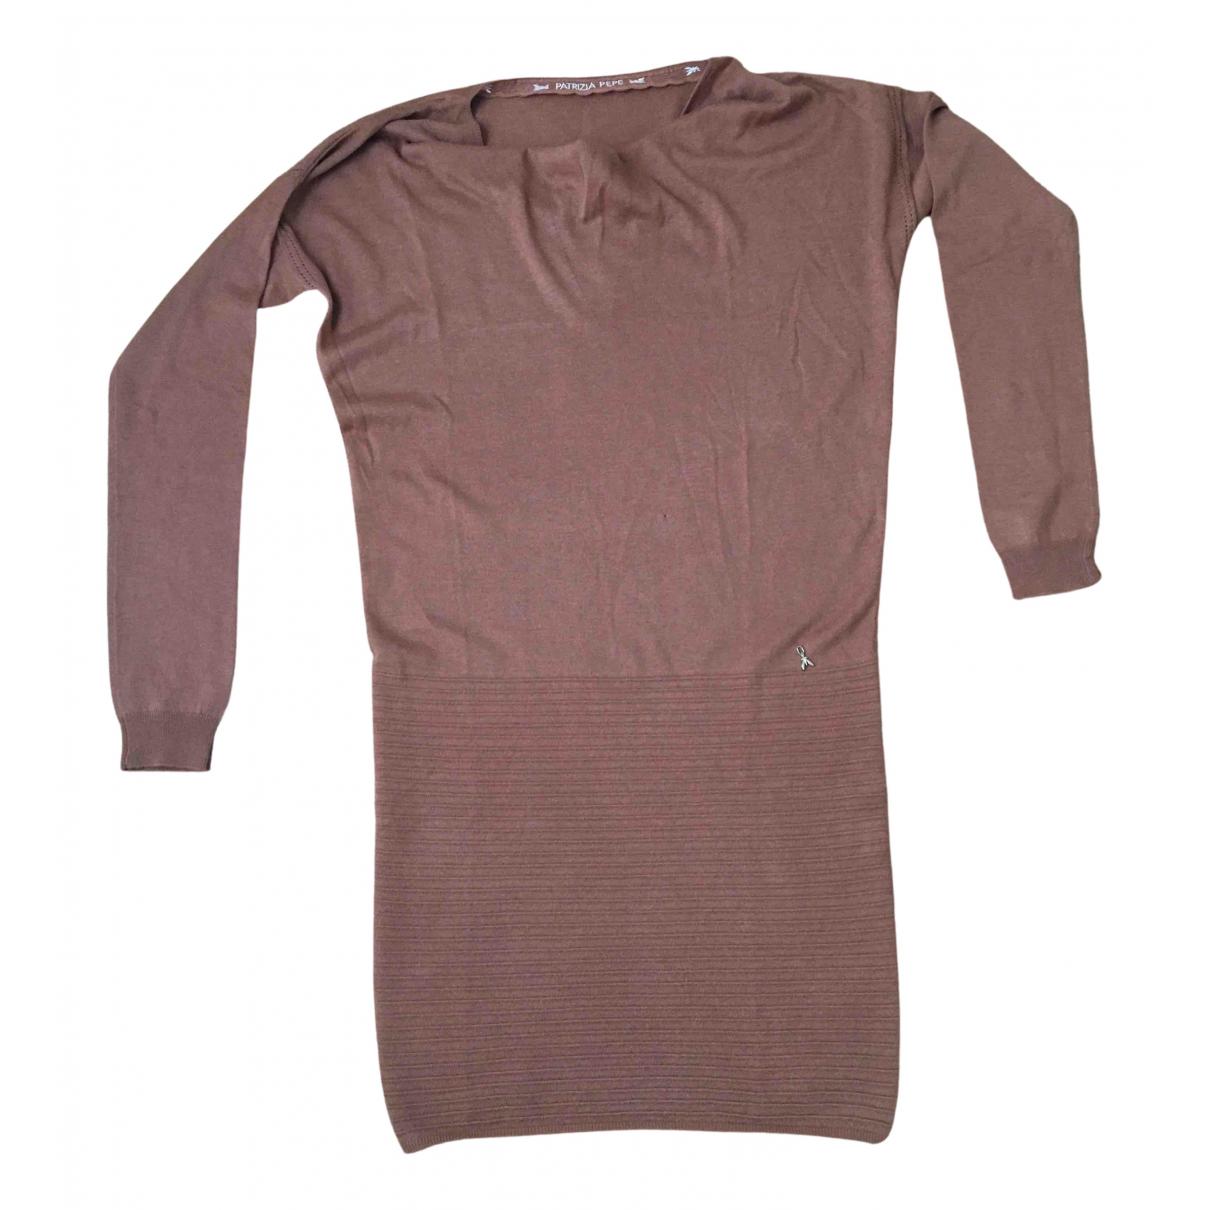 Patrizia Pepe \N Kleid in  Khaki Wolle